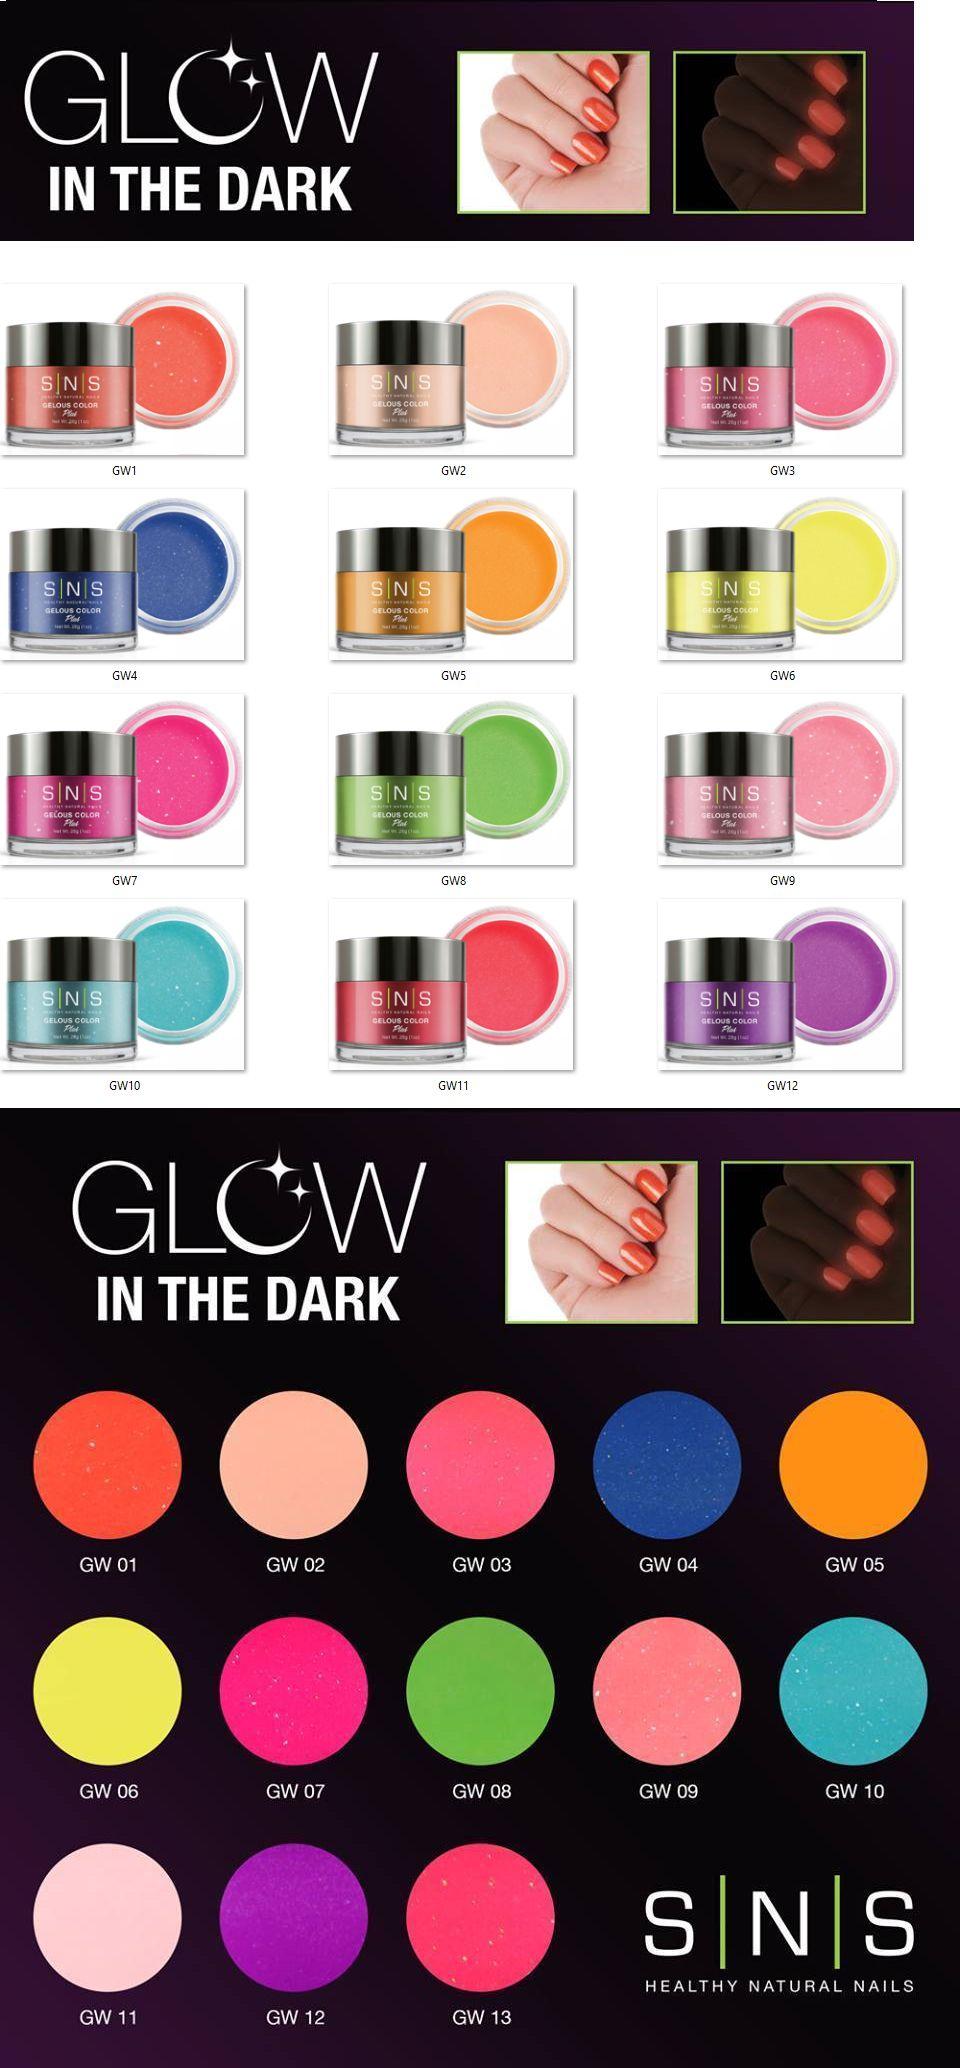 Acrylic Powders and Liquids 182105: Sns Nail Dip Color